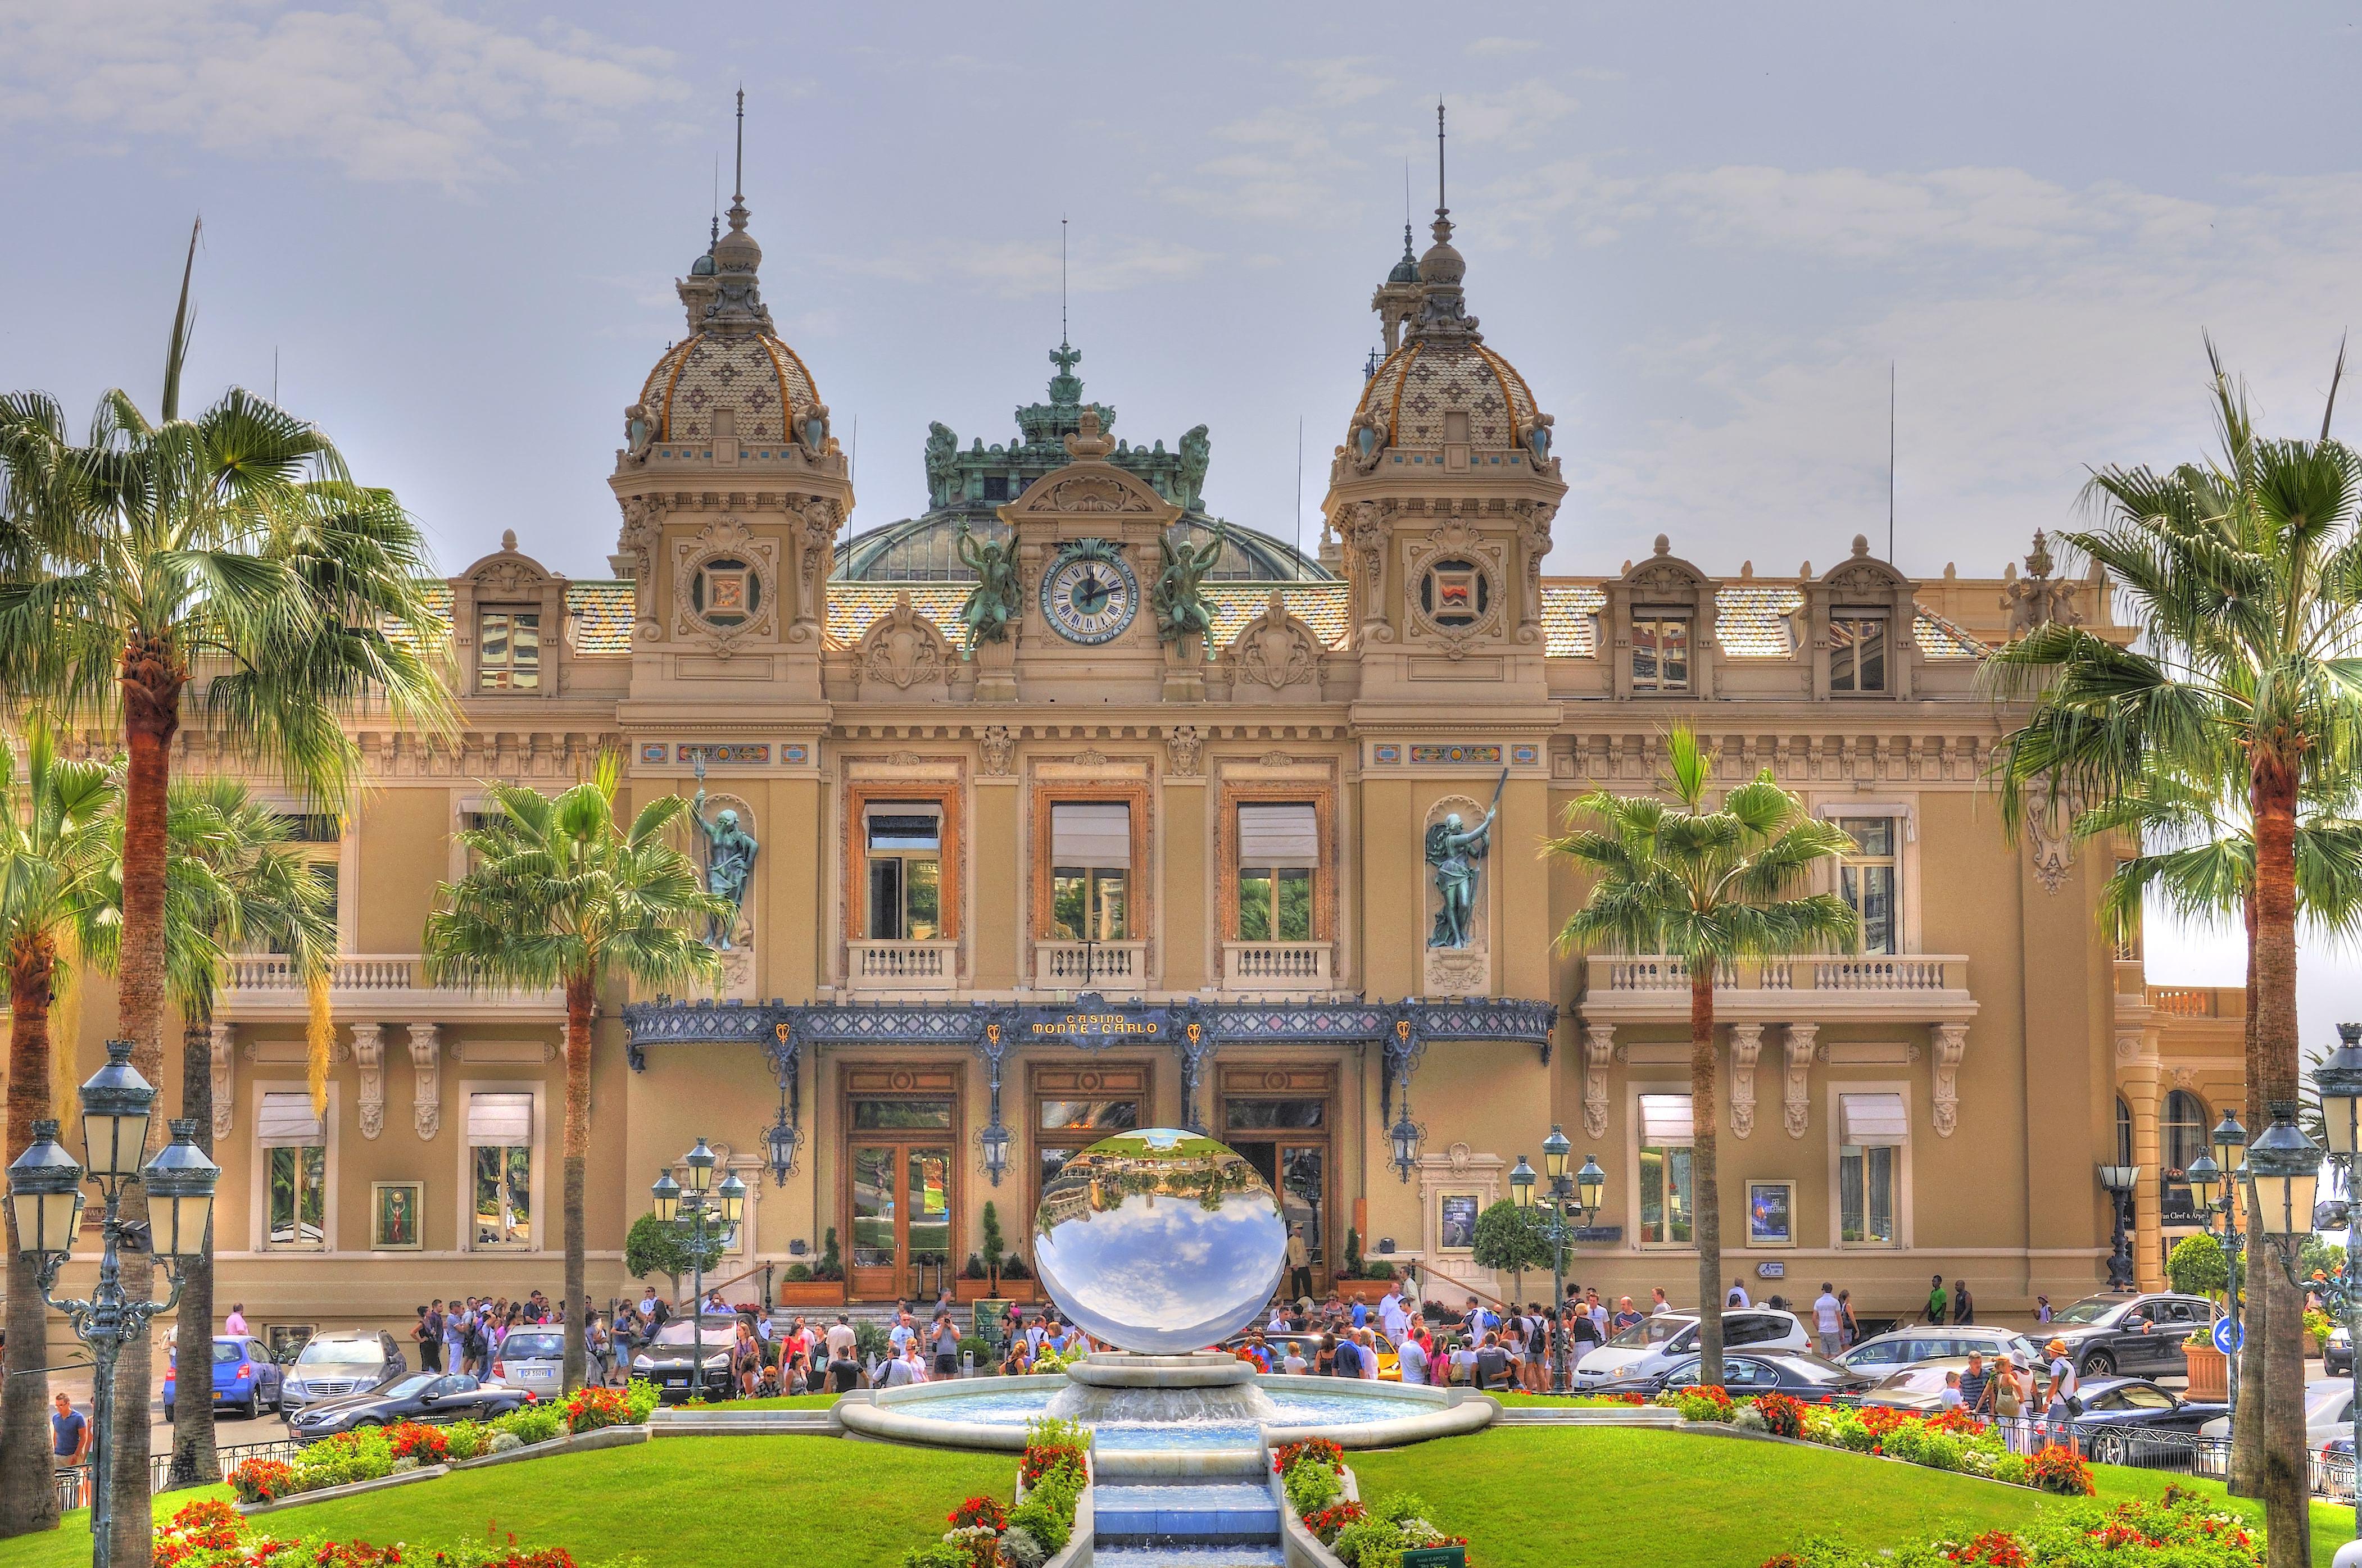 Monte Carlo casino svenskalotter 25021